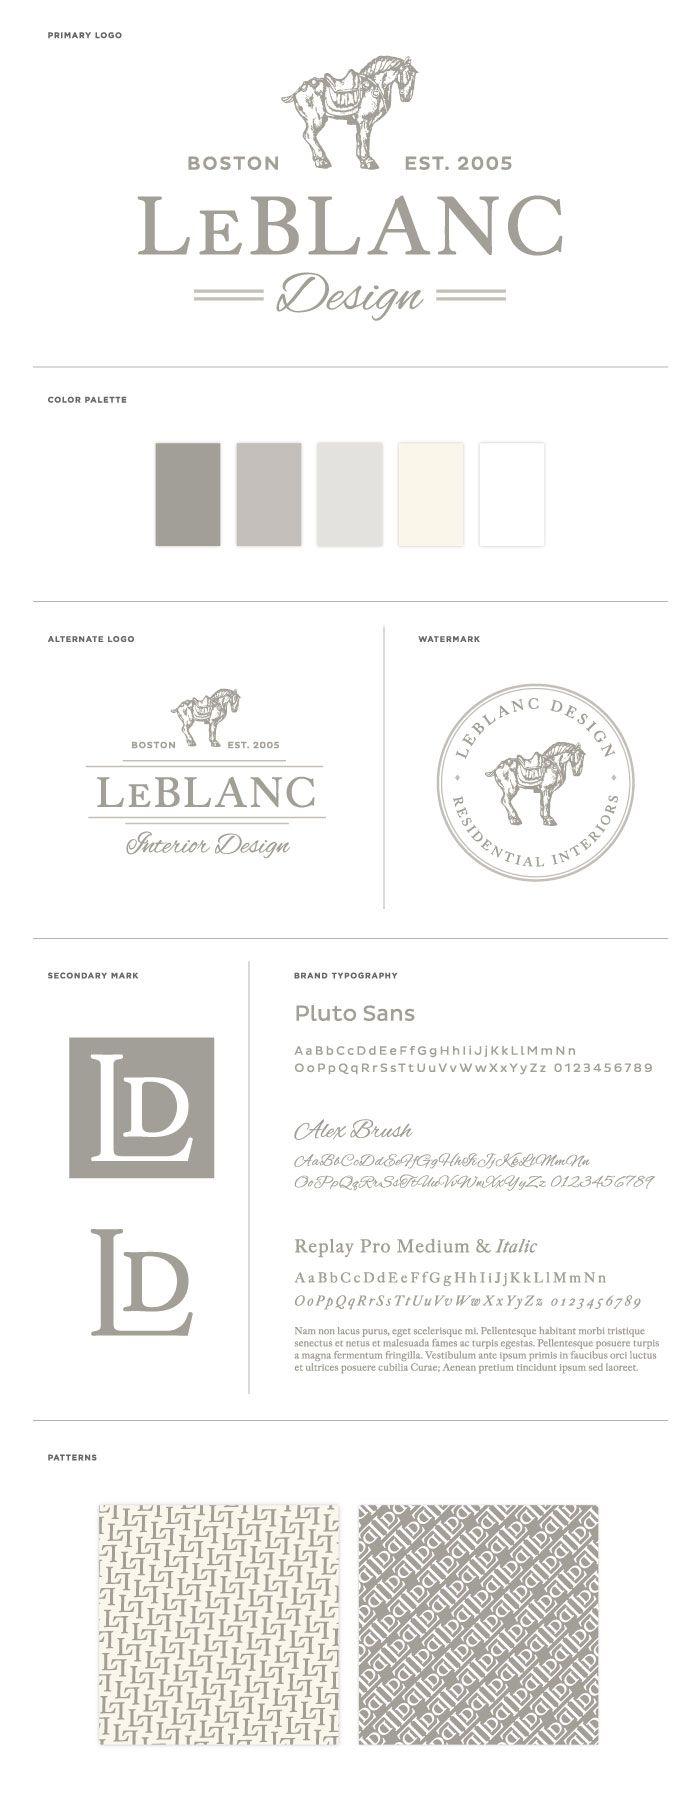 LeBlanc Interior Design Branding and Identity Design by BRAIZEN